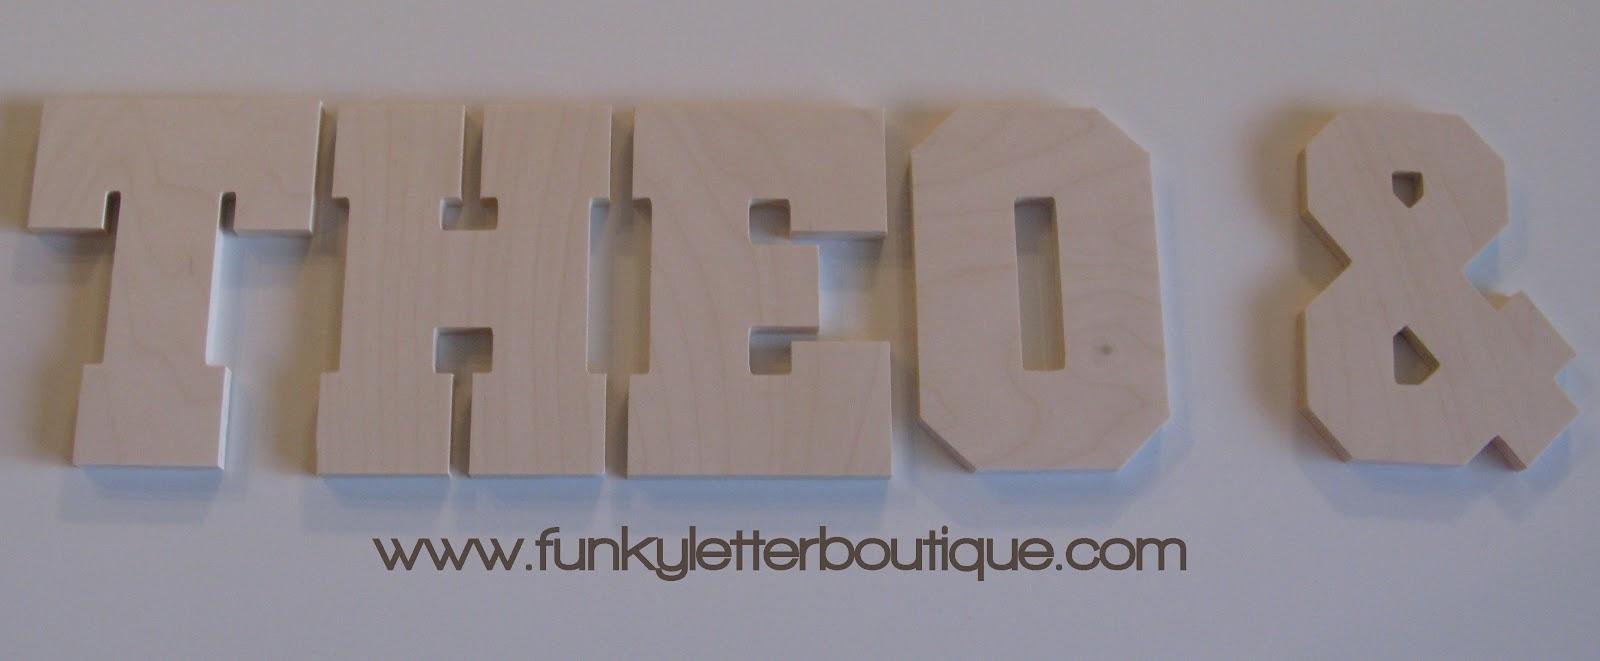 Letters Diy Nursery Letters Diy Home Decor Letters Diy Wood Name